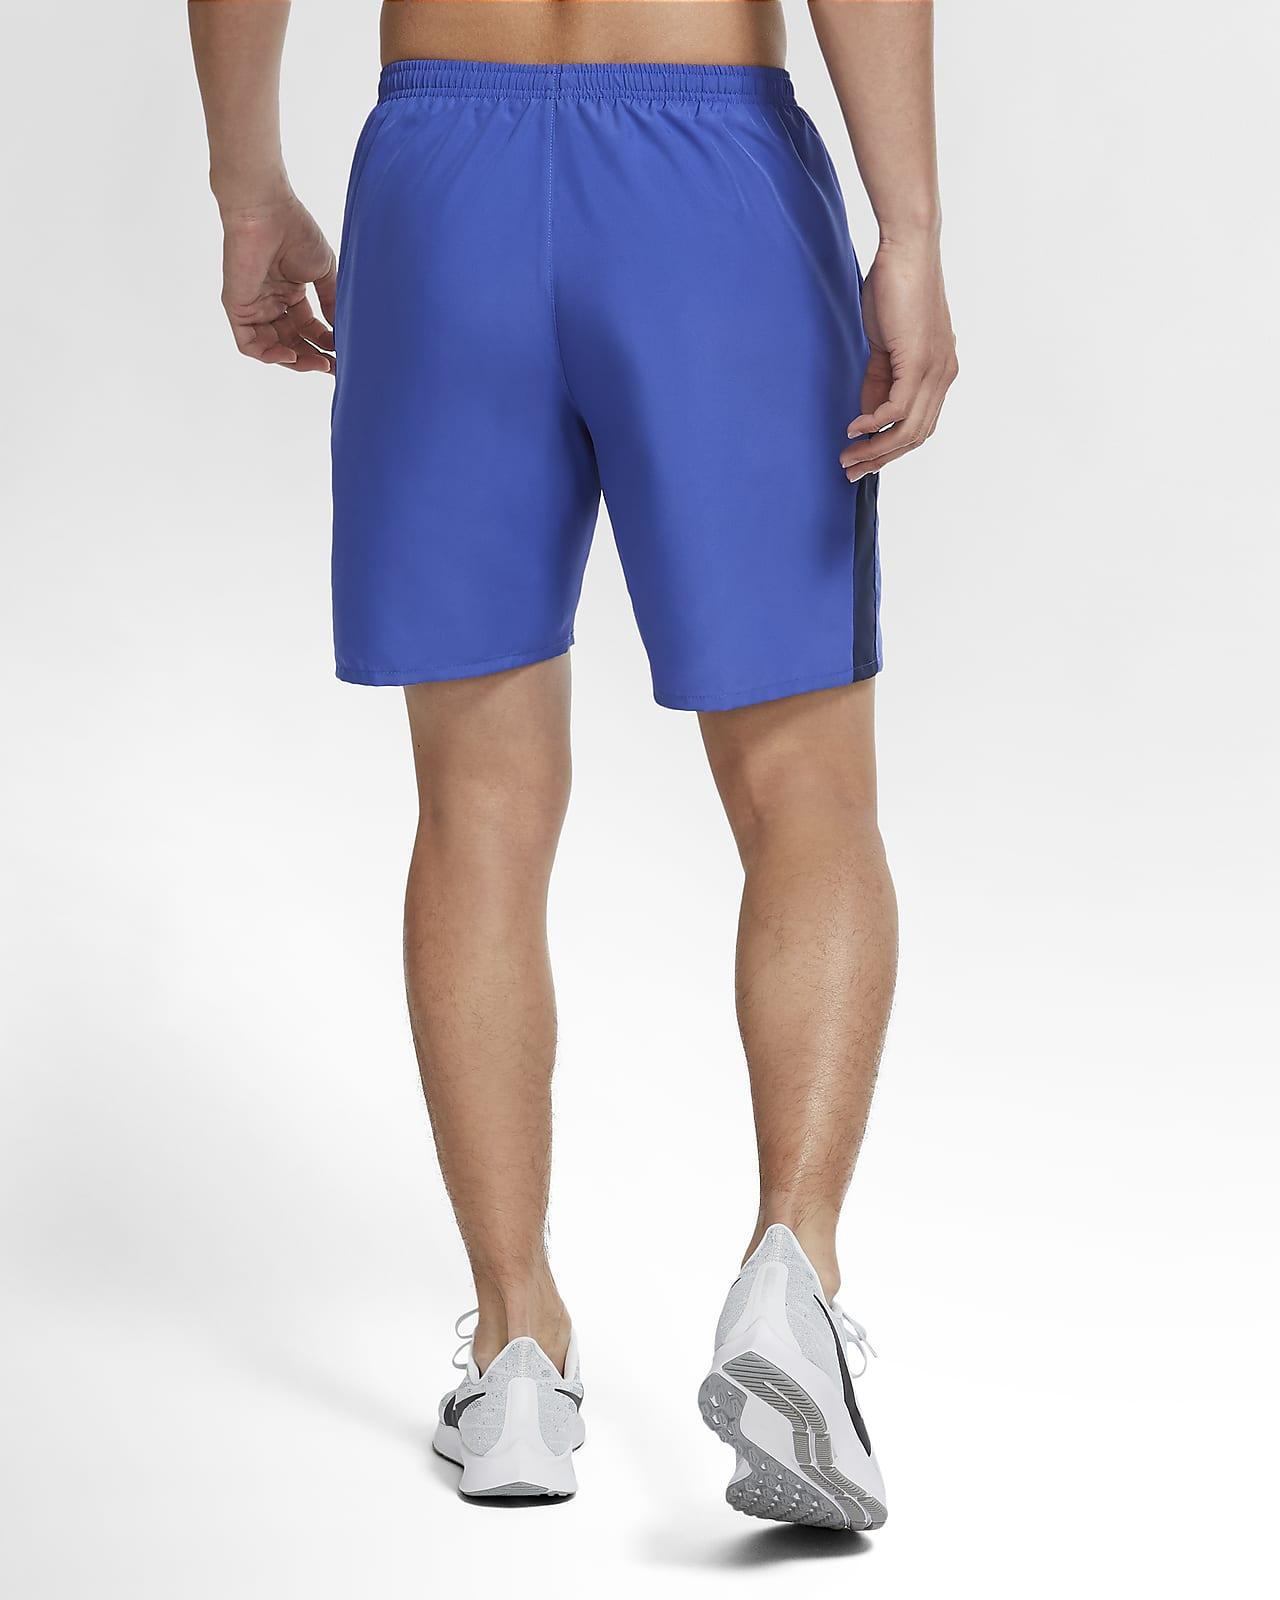 Nike Dri-FIT Wild Run Men's Graphic